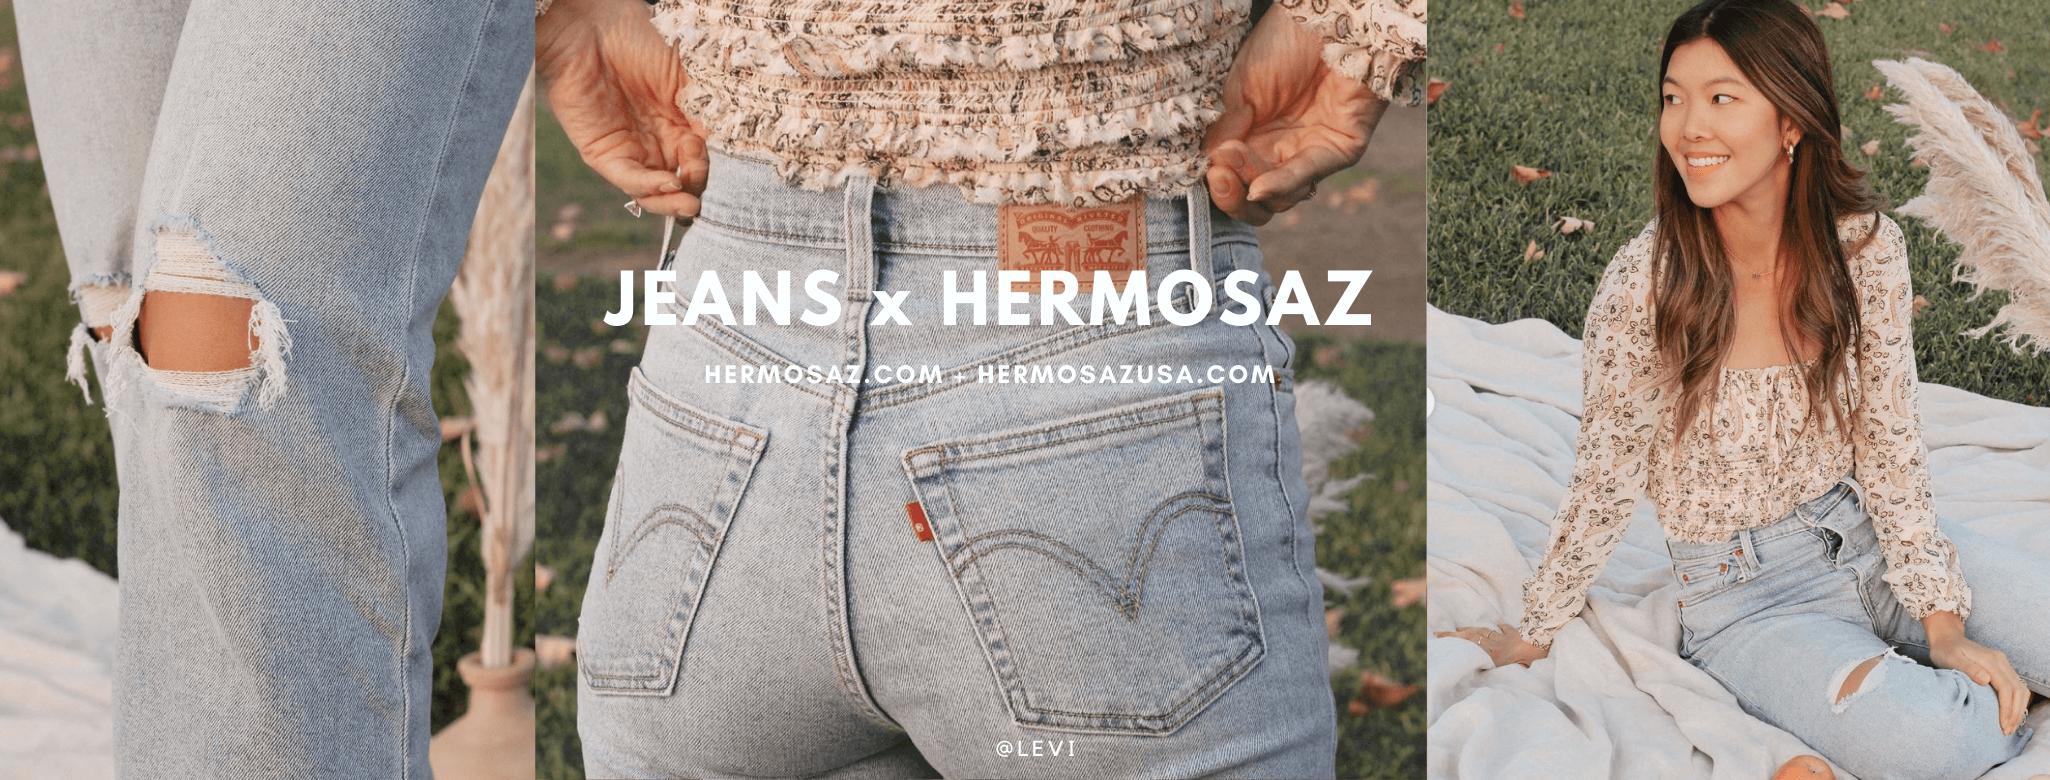 Levi x Hermosaz